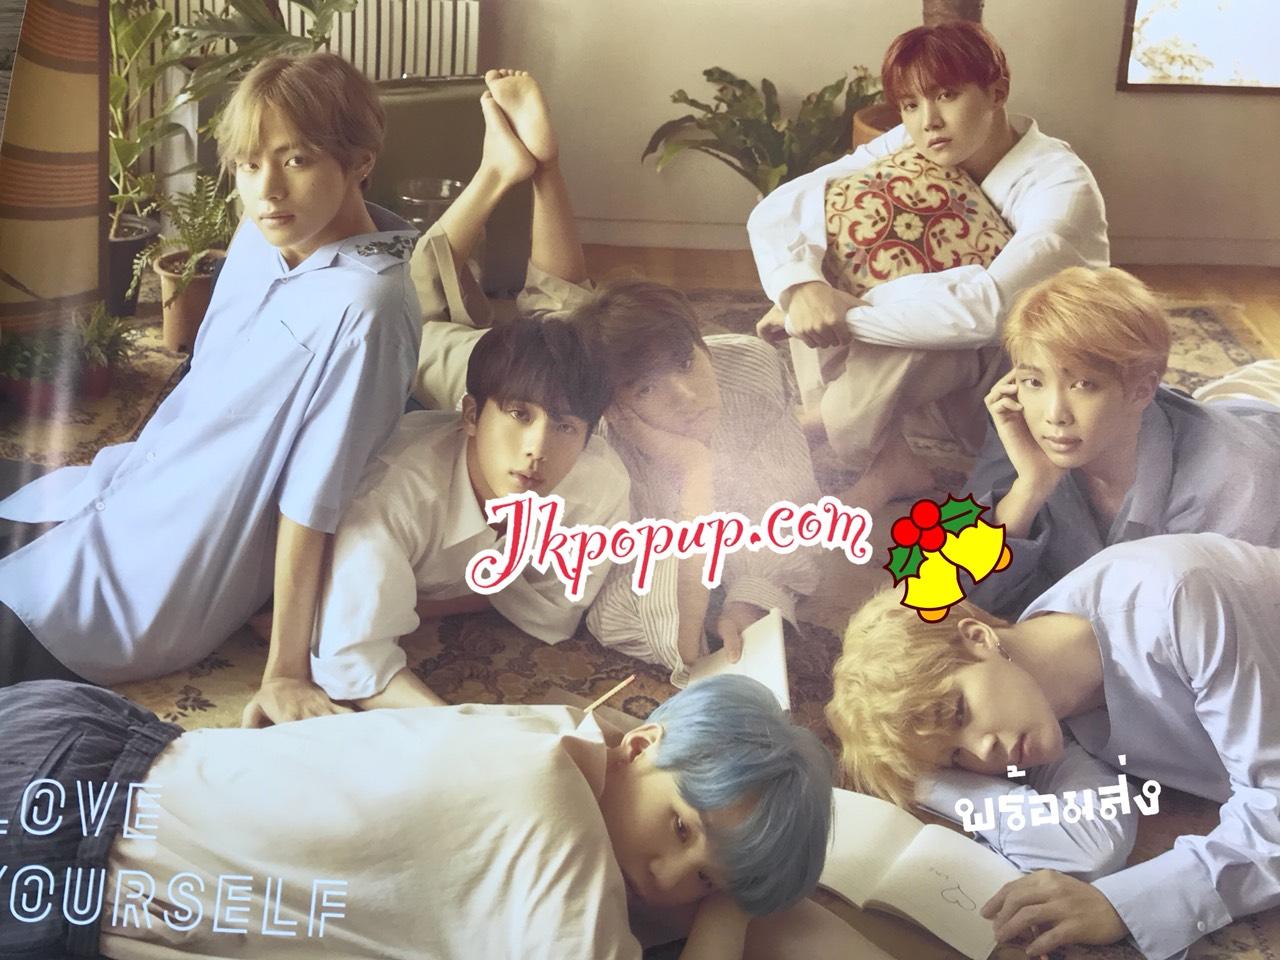 BTS - Mini Album Vol.5 [LOVE YOURSELF 承 Her] โปสเตอร์ แบบที่ 1 พร้อมกระบอกโปสเตอร์ พร้อมส่ง